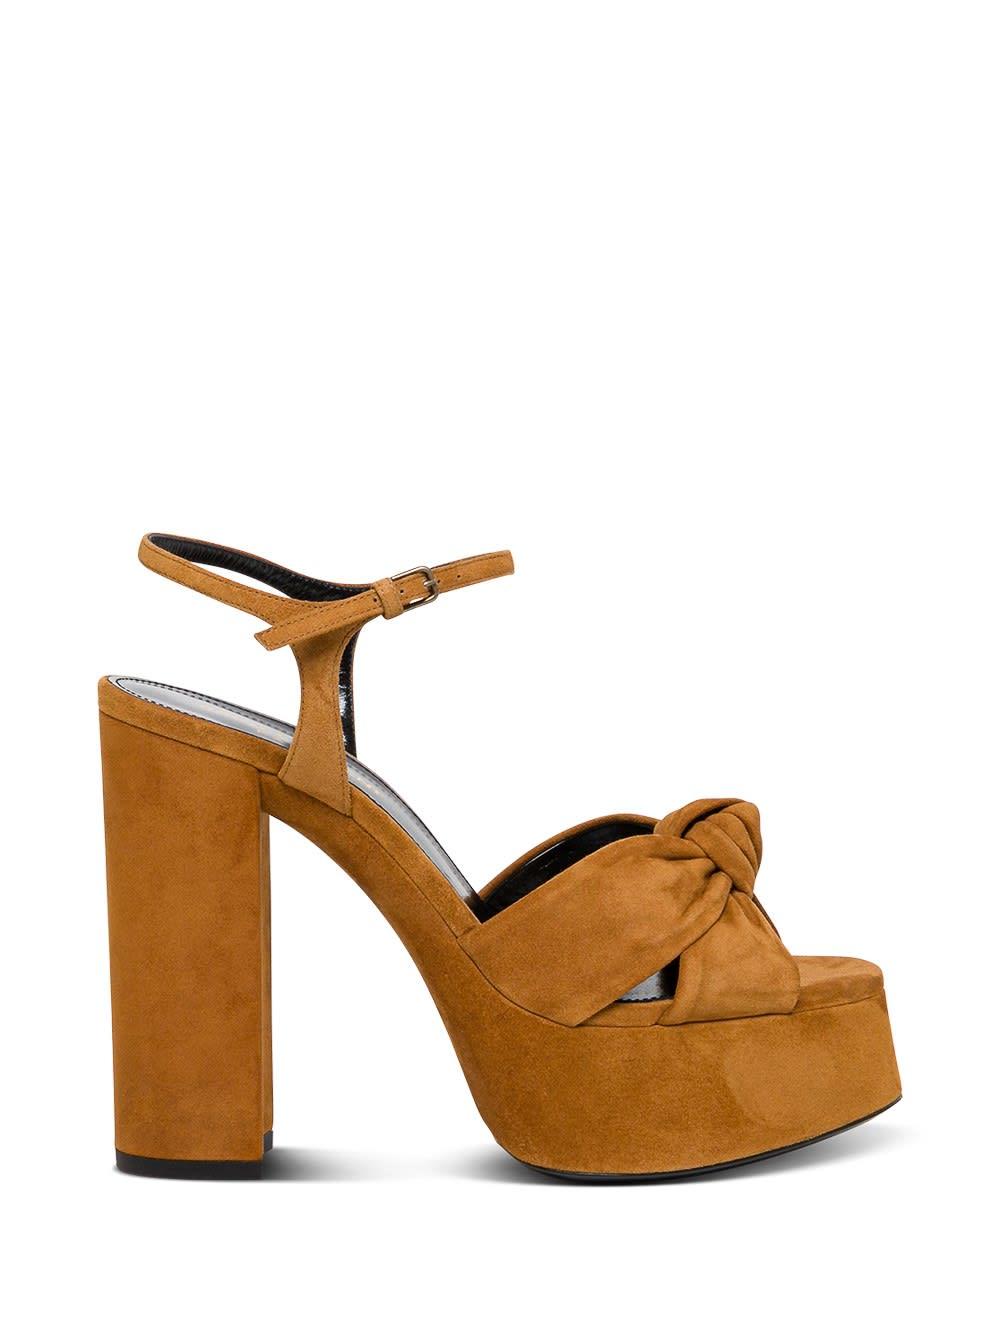 Buy Saint Laurent Bianca Suede Leather Sandals online, shop Saint Laurent shoes with free shipping